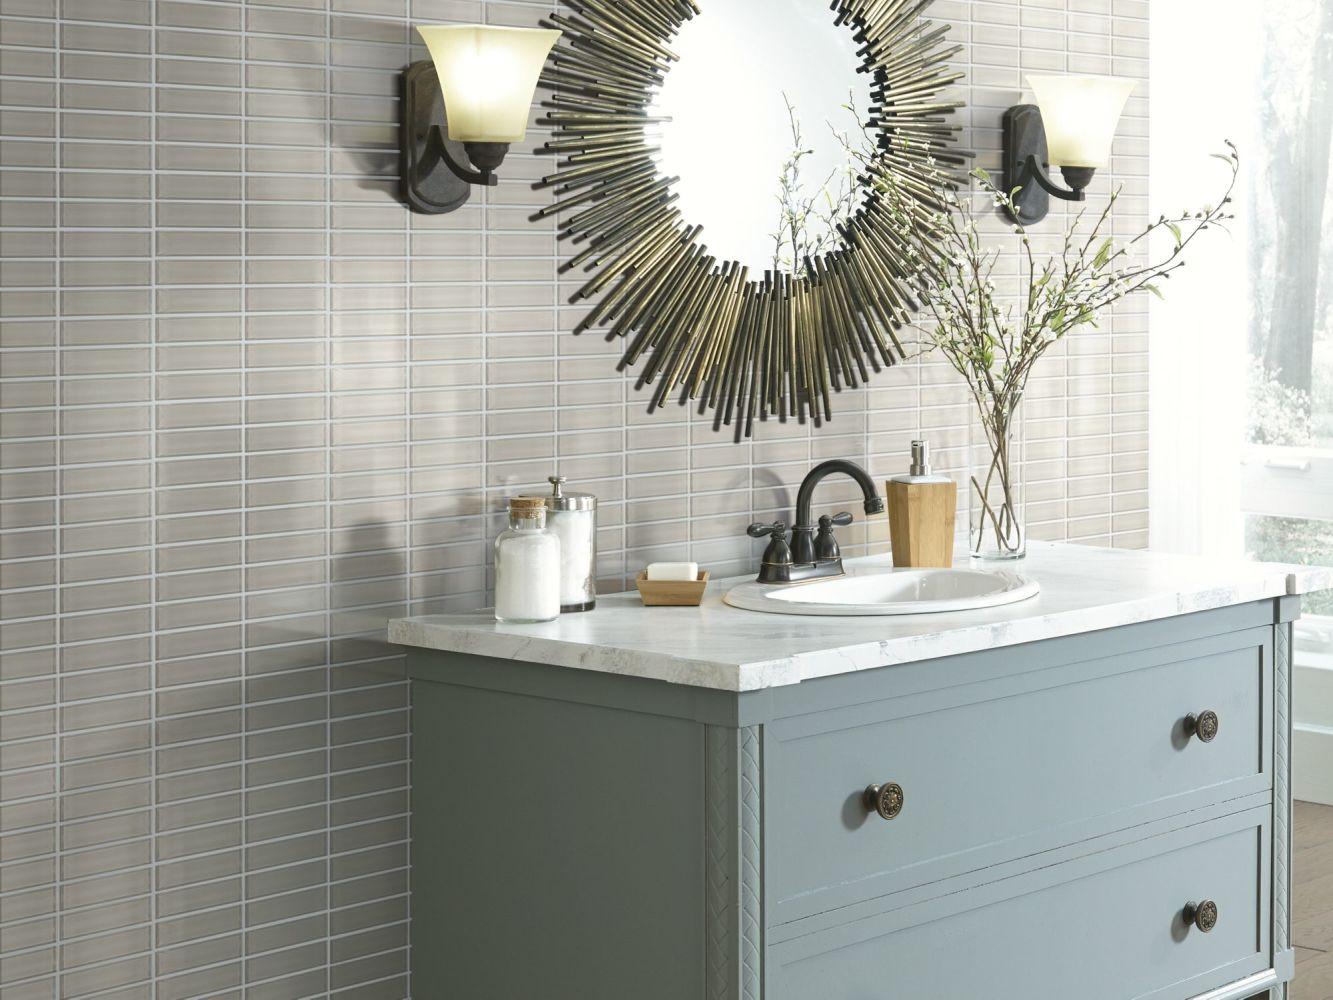 Shaw Floors Home Fn Gold Ceramic Principal Stacked Glass Mosaic Mist 00250_TG83B